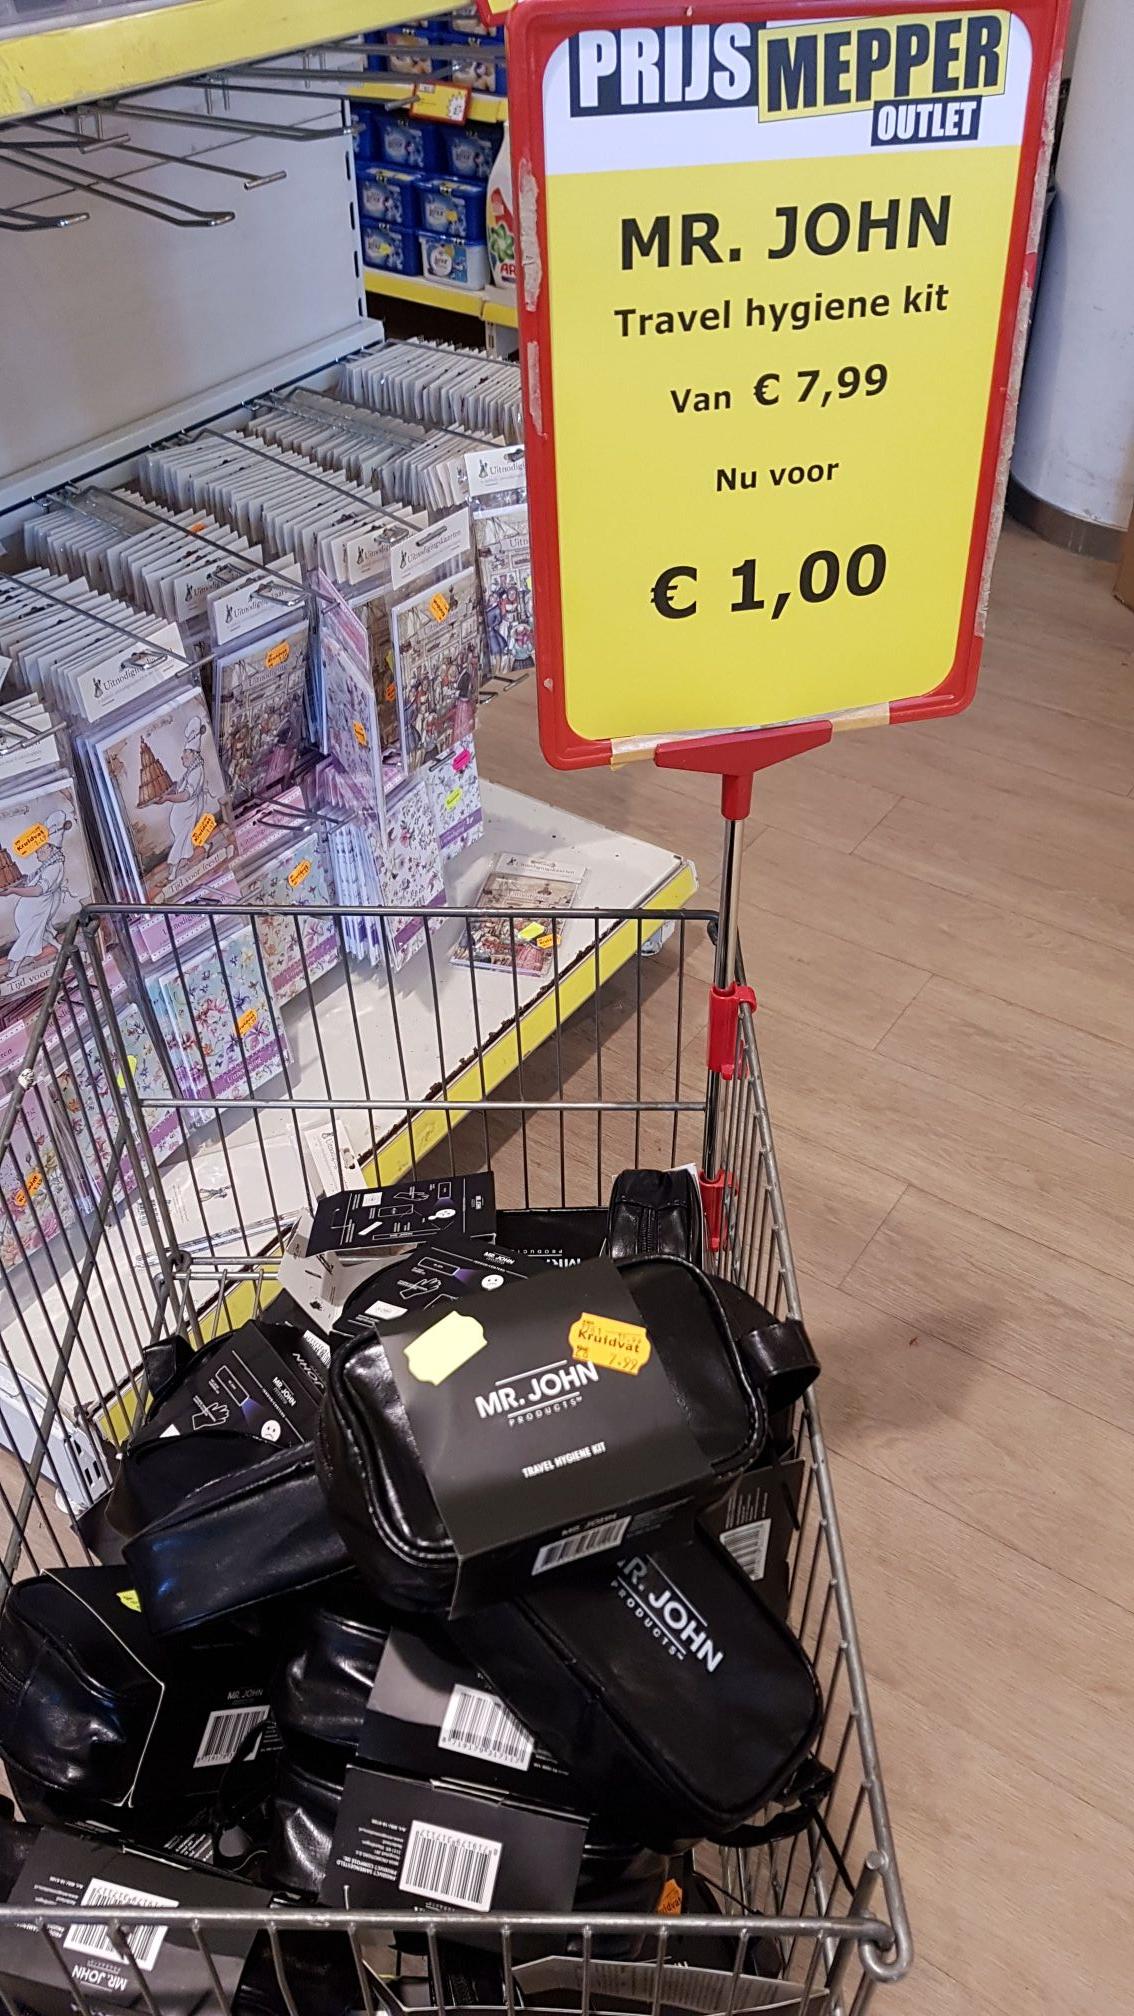 Mr John products travel hygiene kit @Prijsmepper Zoetermeer